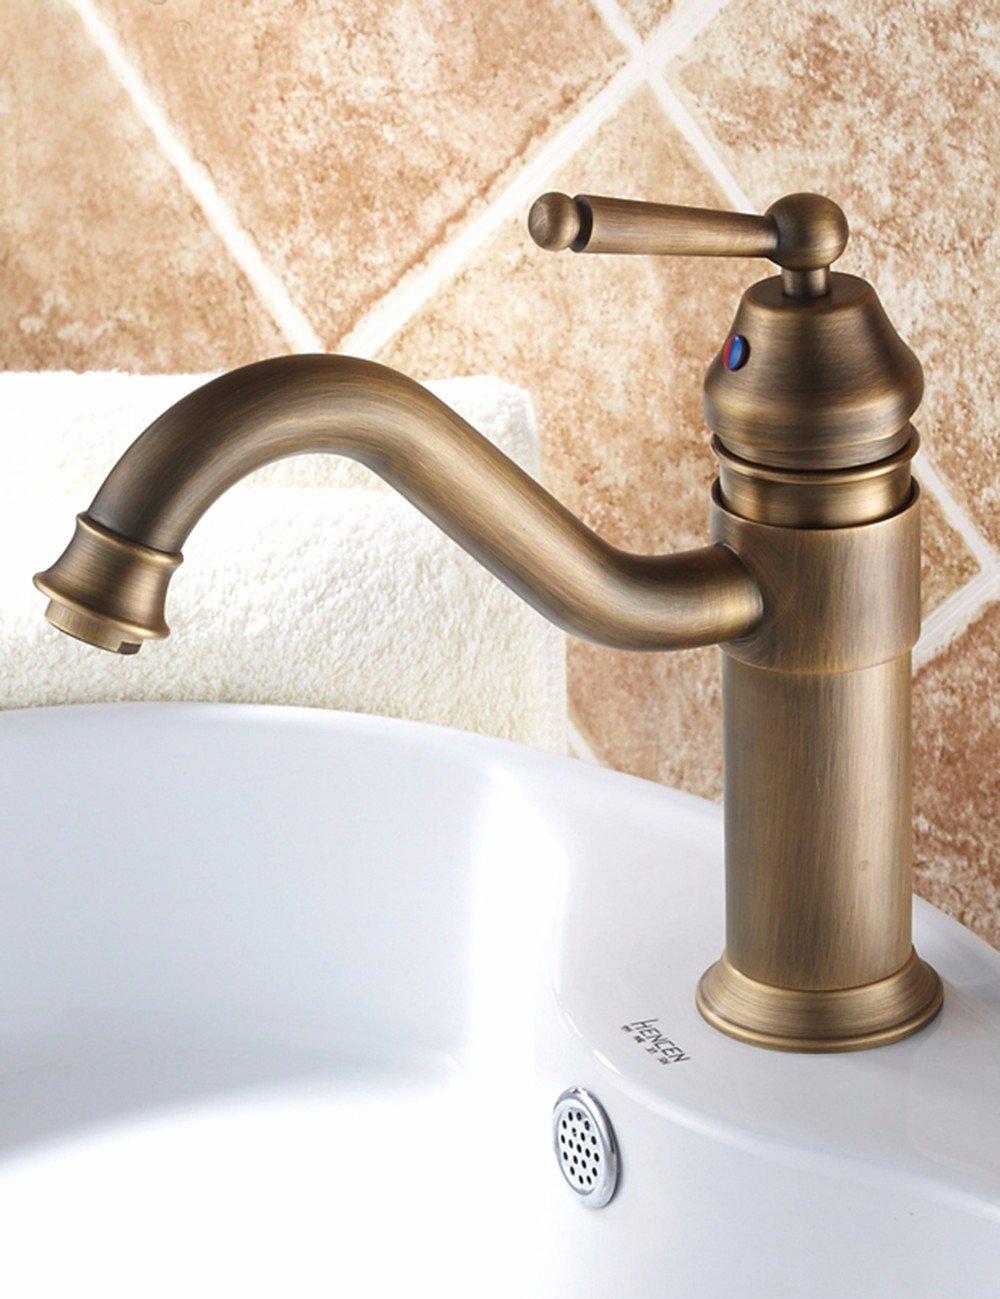 Hlluya Professional Sink Mixer Tap Kitchen Faucet Antique-brass faucet basin wash basin mixer cool retro faucet single hole Faucet